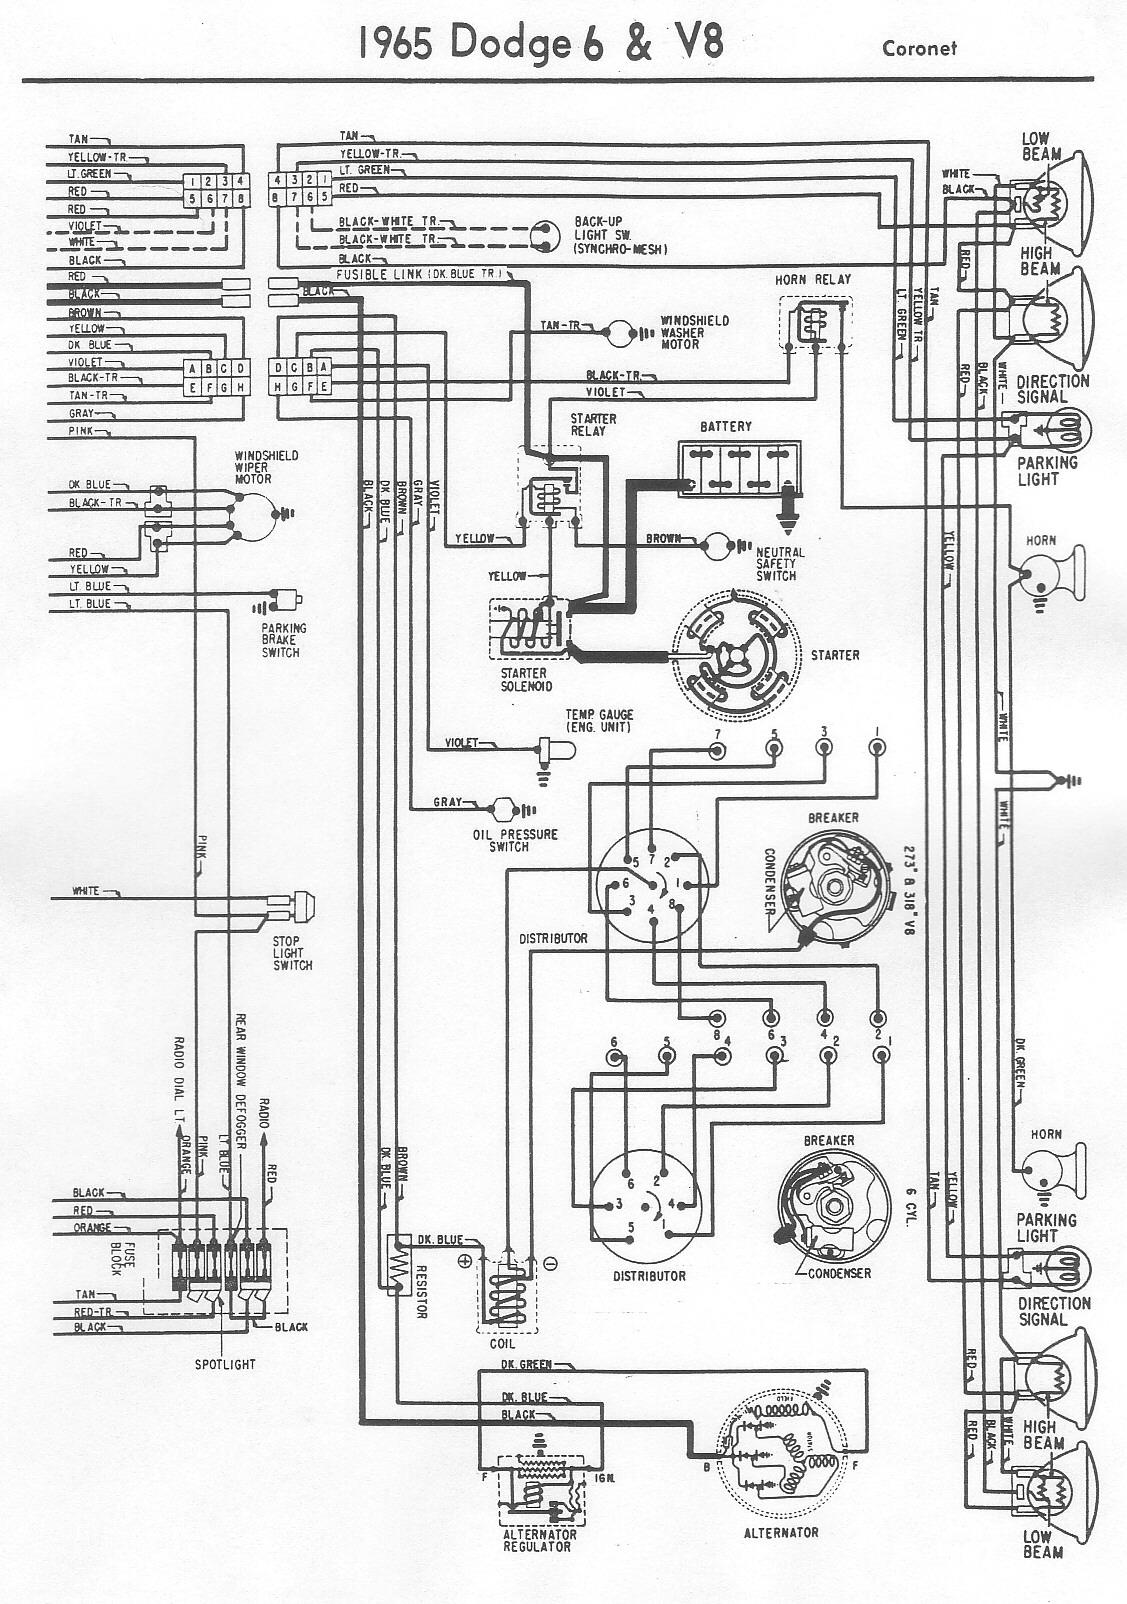 medium resolution of 1965 coronet wiring harness wiring library u2022 1998 dodge truck wiring diagram 1960 dodge wiring